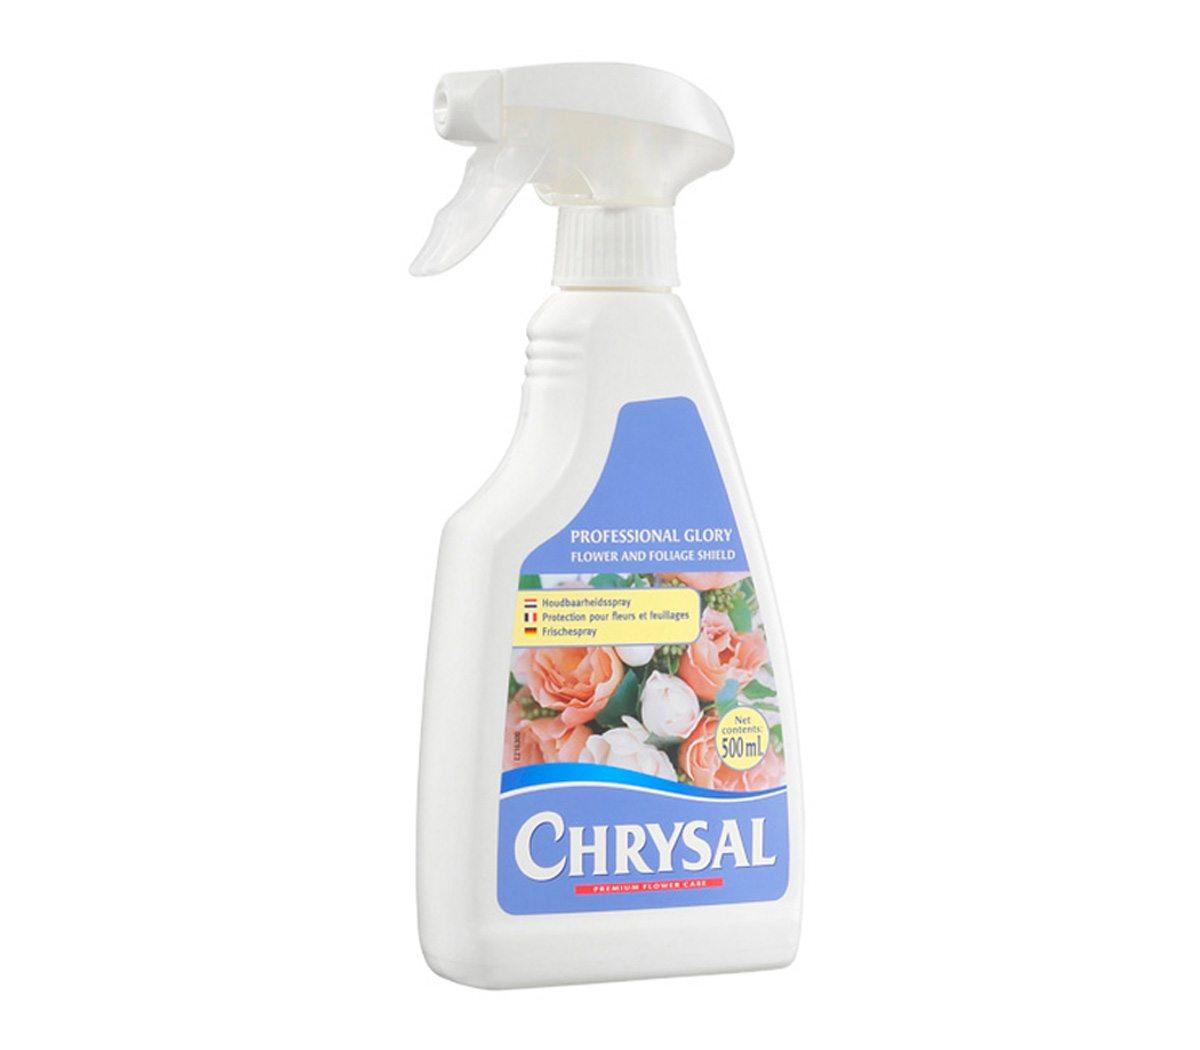 Silk And Dried Flower Cleaner 1 X 17 Fl Oz Chrysal Flower Food